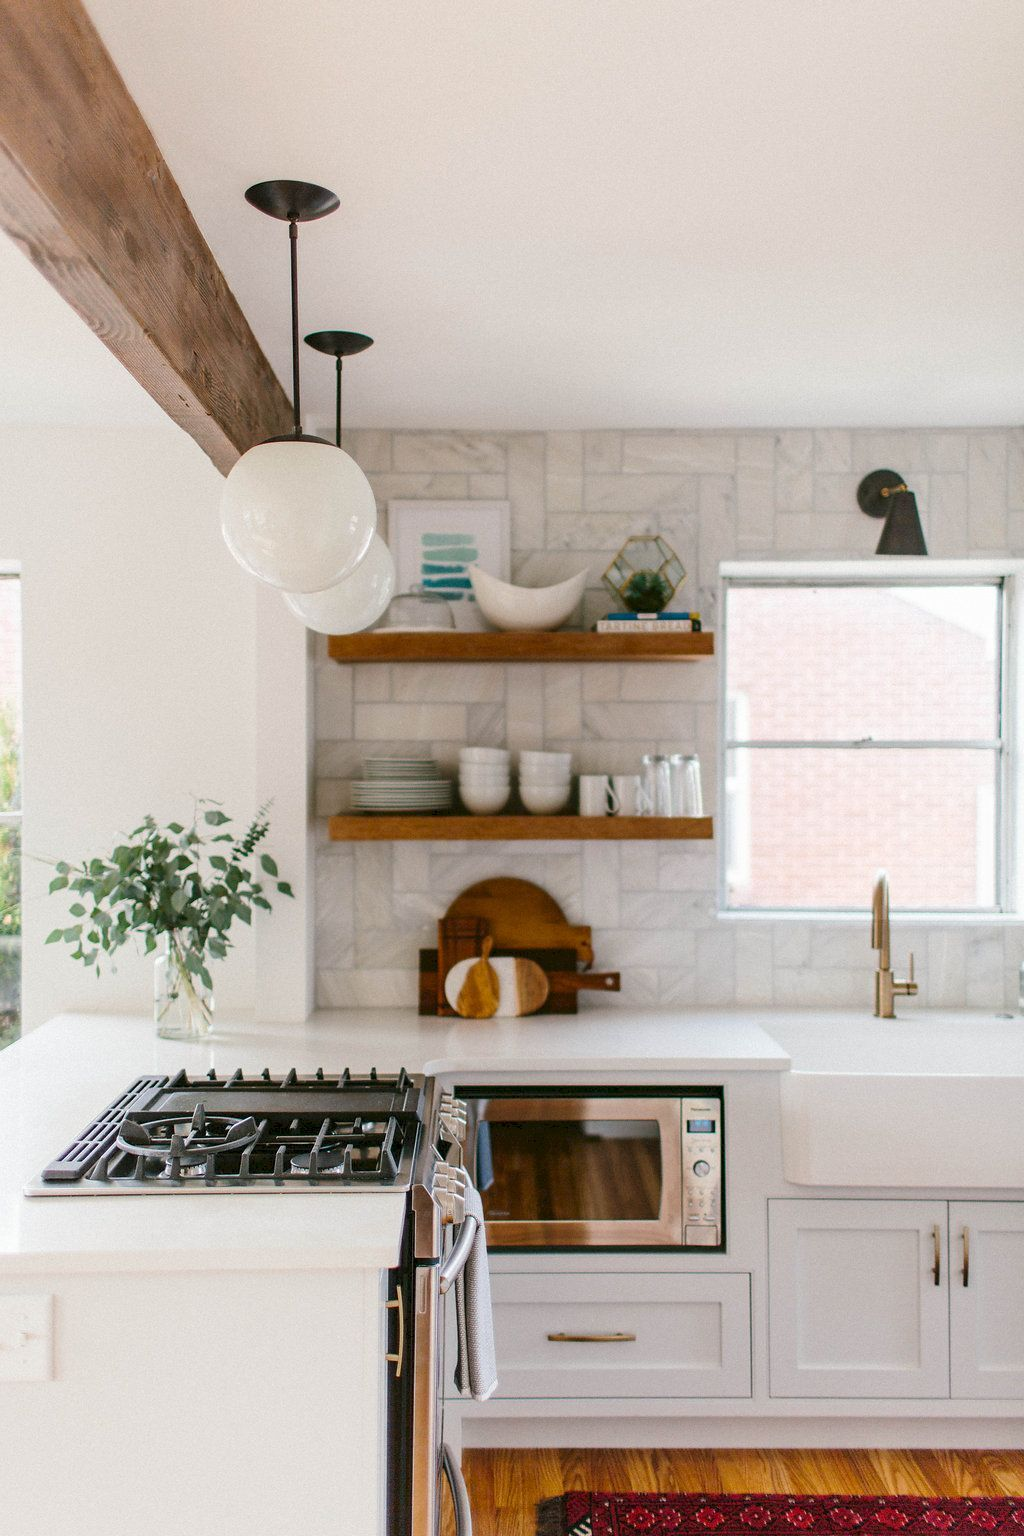 Minimalist Kitchens with Timeless Decoration #minimalistkitchen